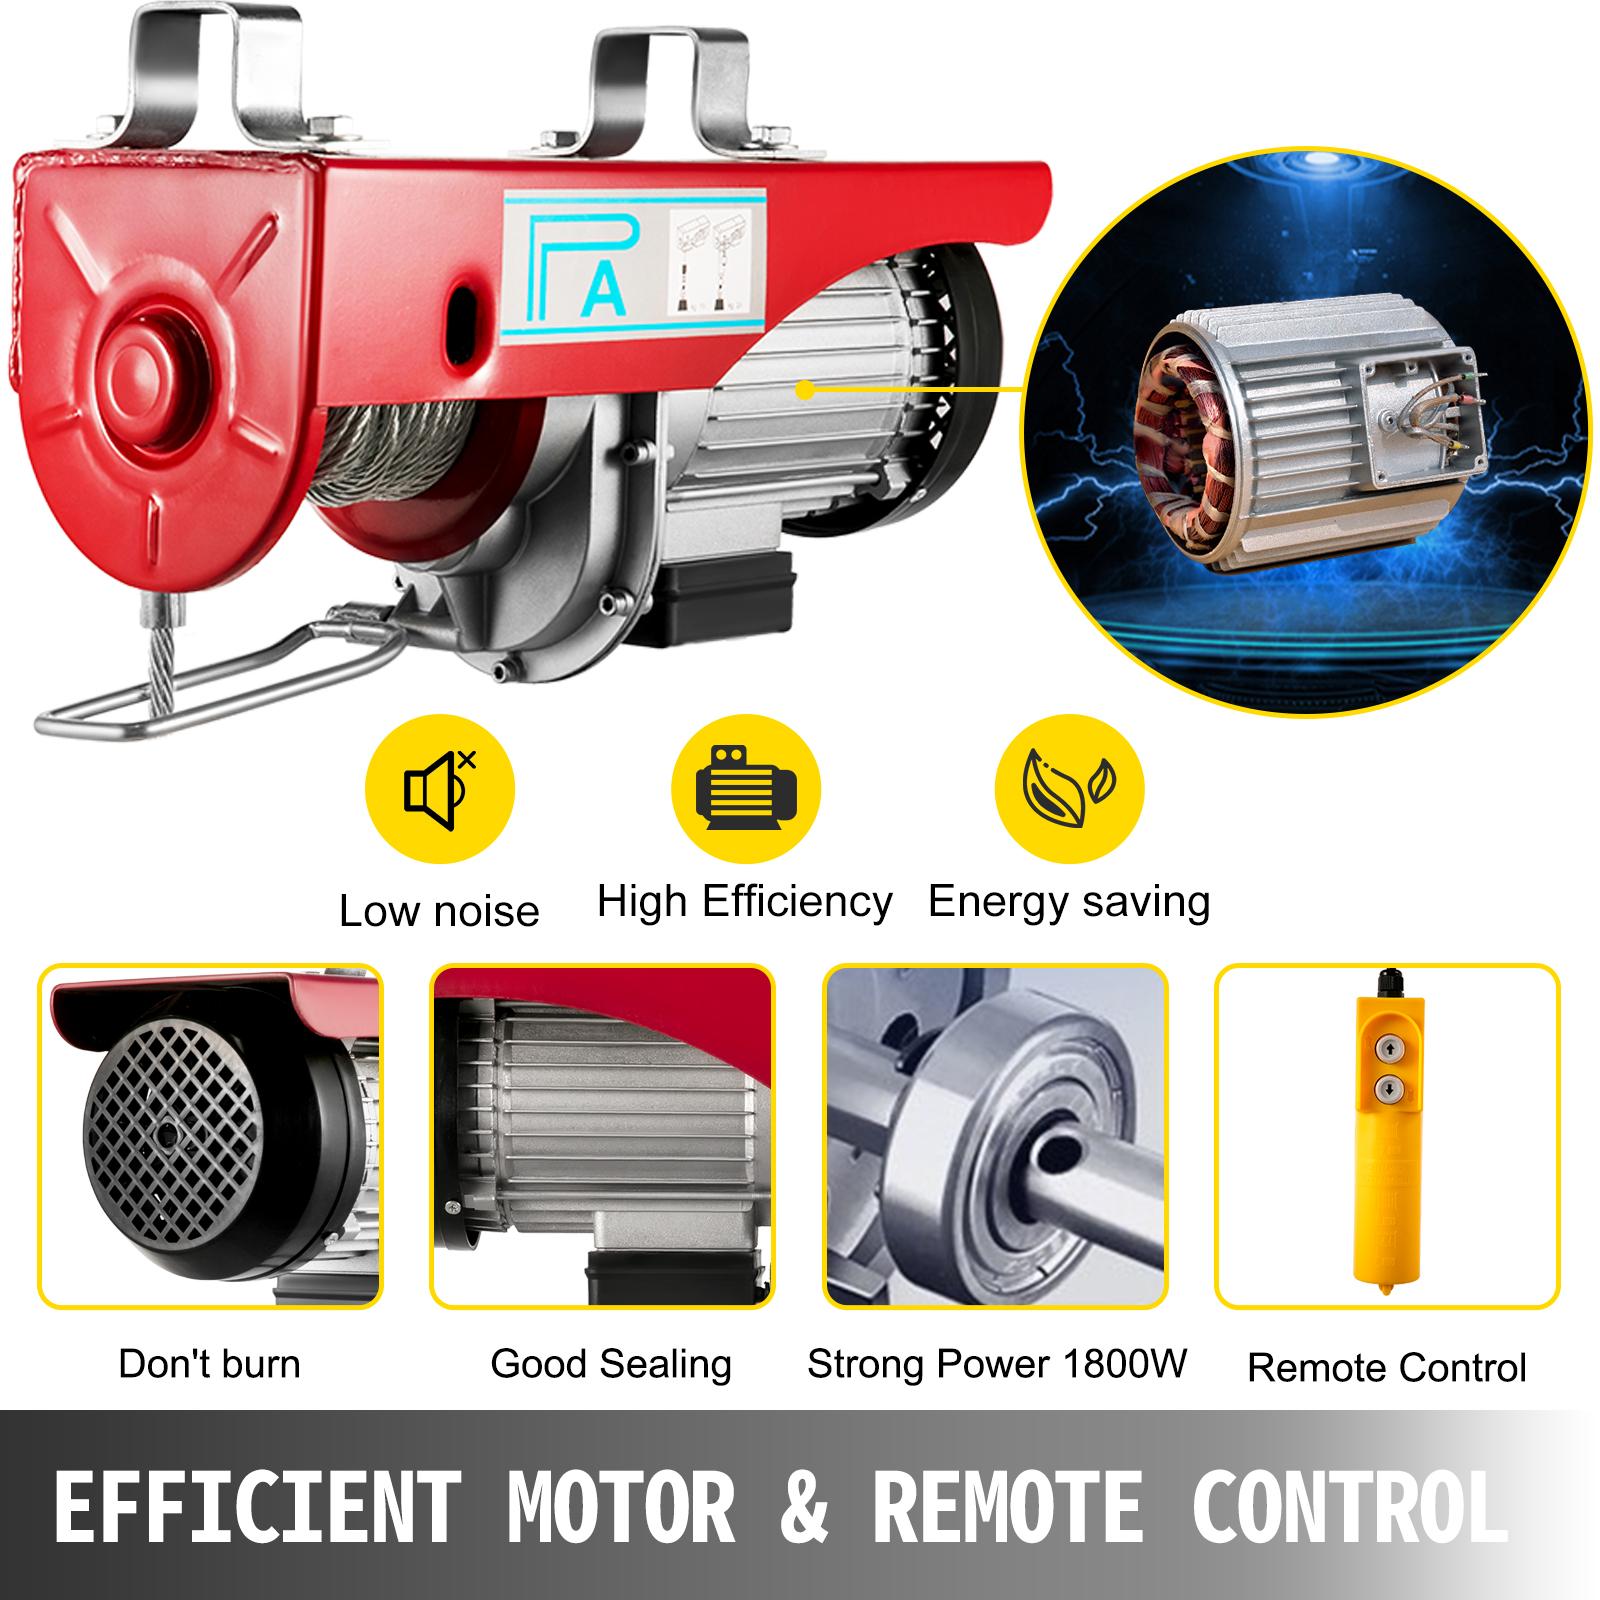 100kg-900kg-Electric-Hoist-Winch-Lifting-Engine-Crane-Cable-Lift-Hook-Garage miniature 76